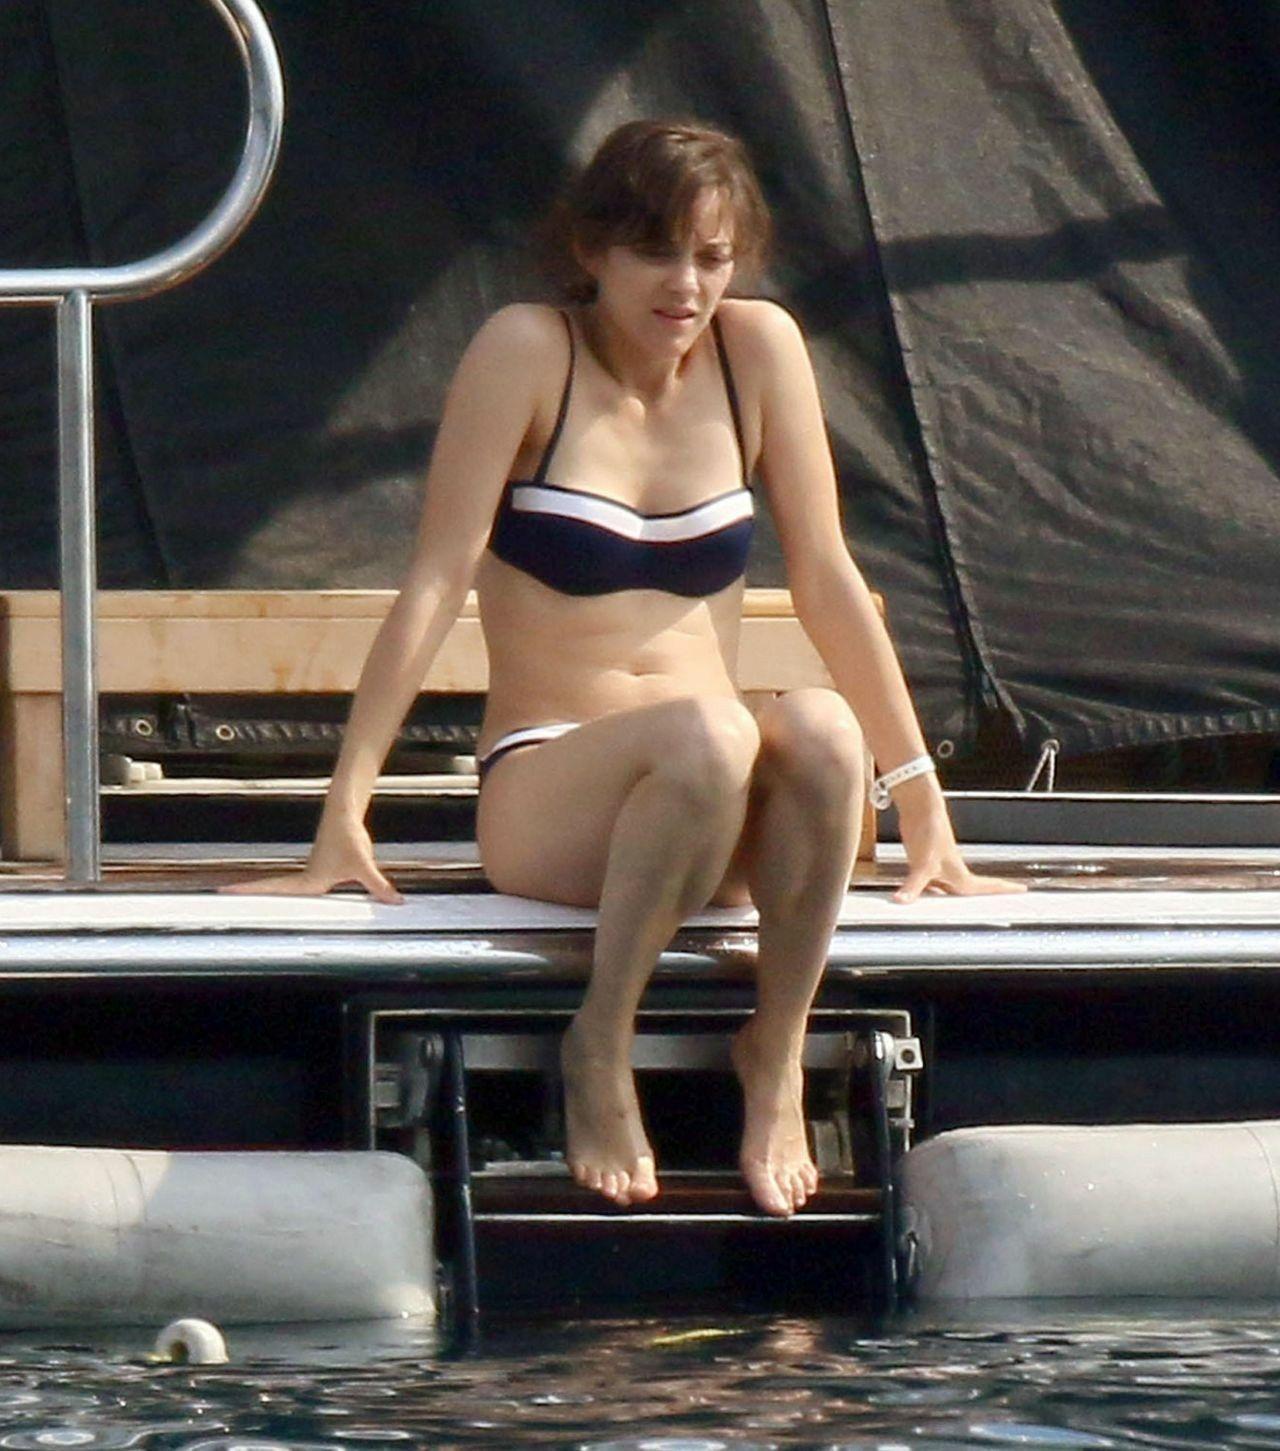 Marion Cotillard In A Bikini On A Yacht In Cannes June 2014 B